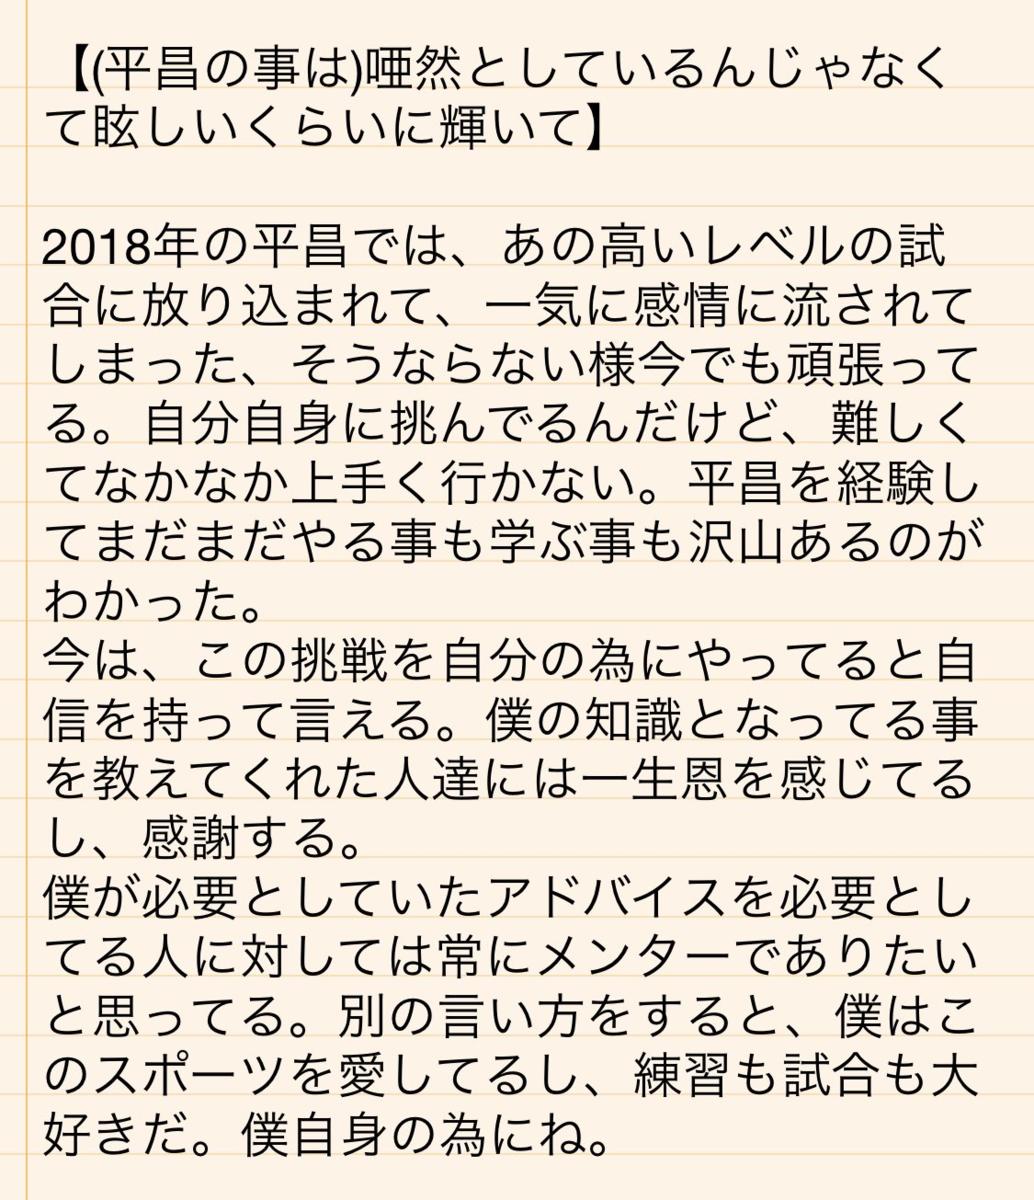 f:id:marosakura:20200921034621p:plain